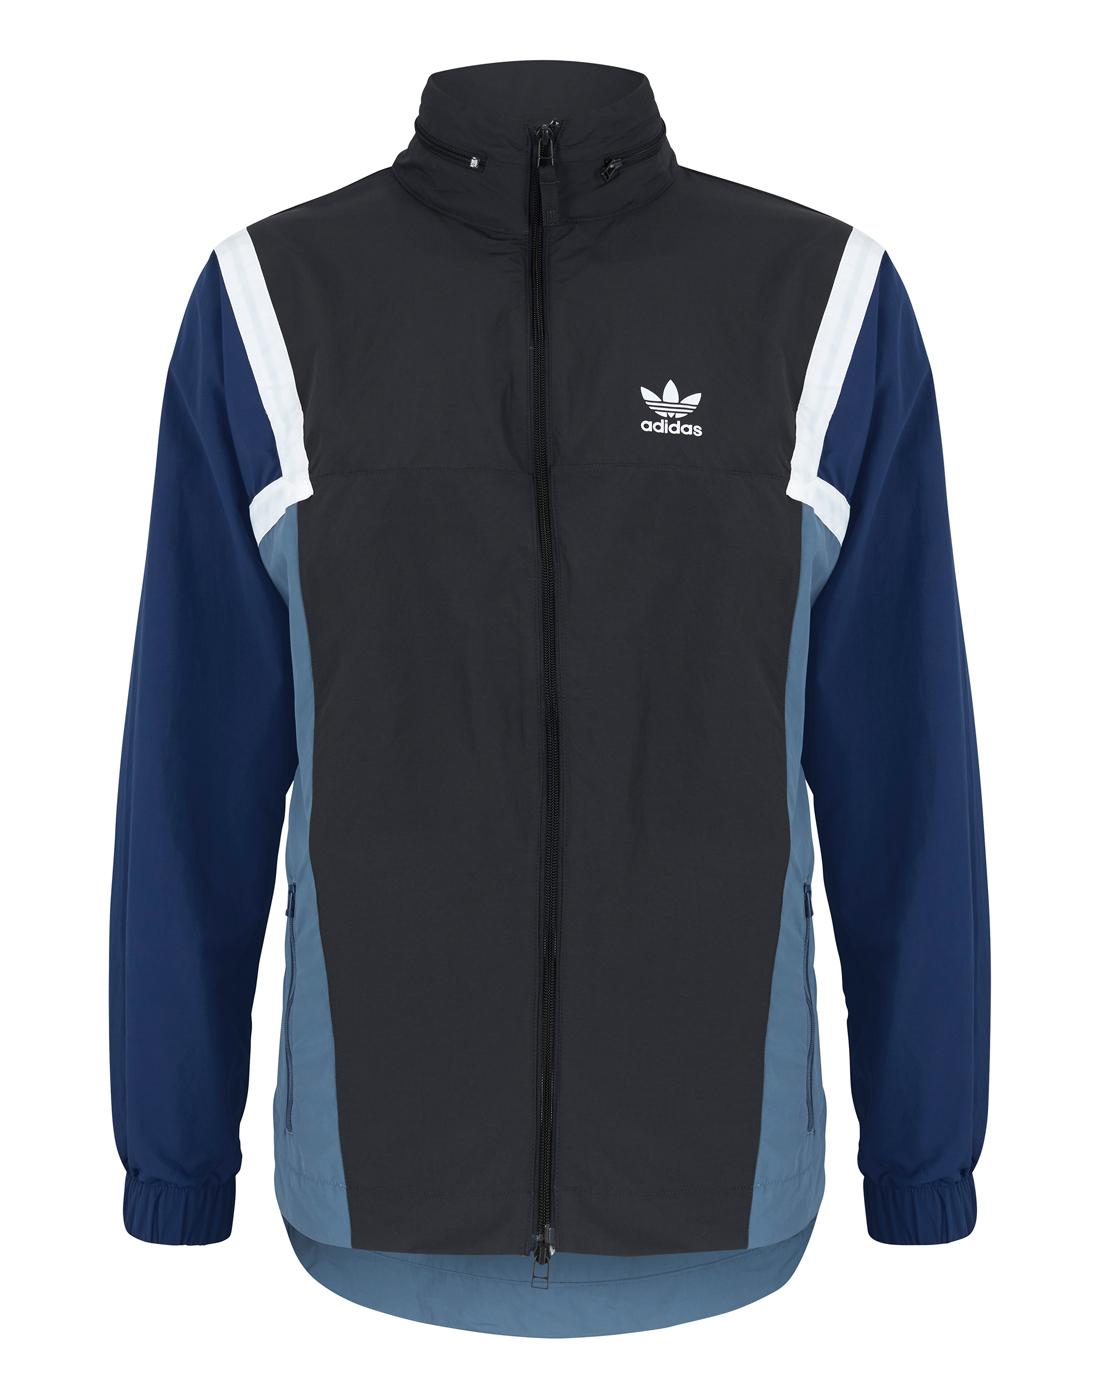 Mens Style Wind Sports Nova Originals Adidas JacketLife wN8vn0Om